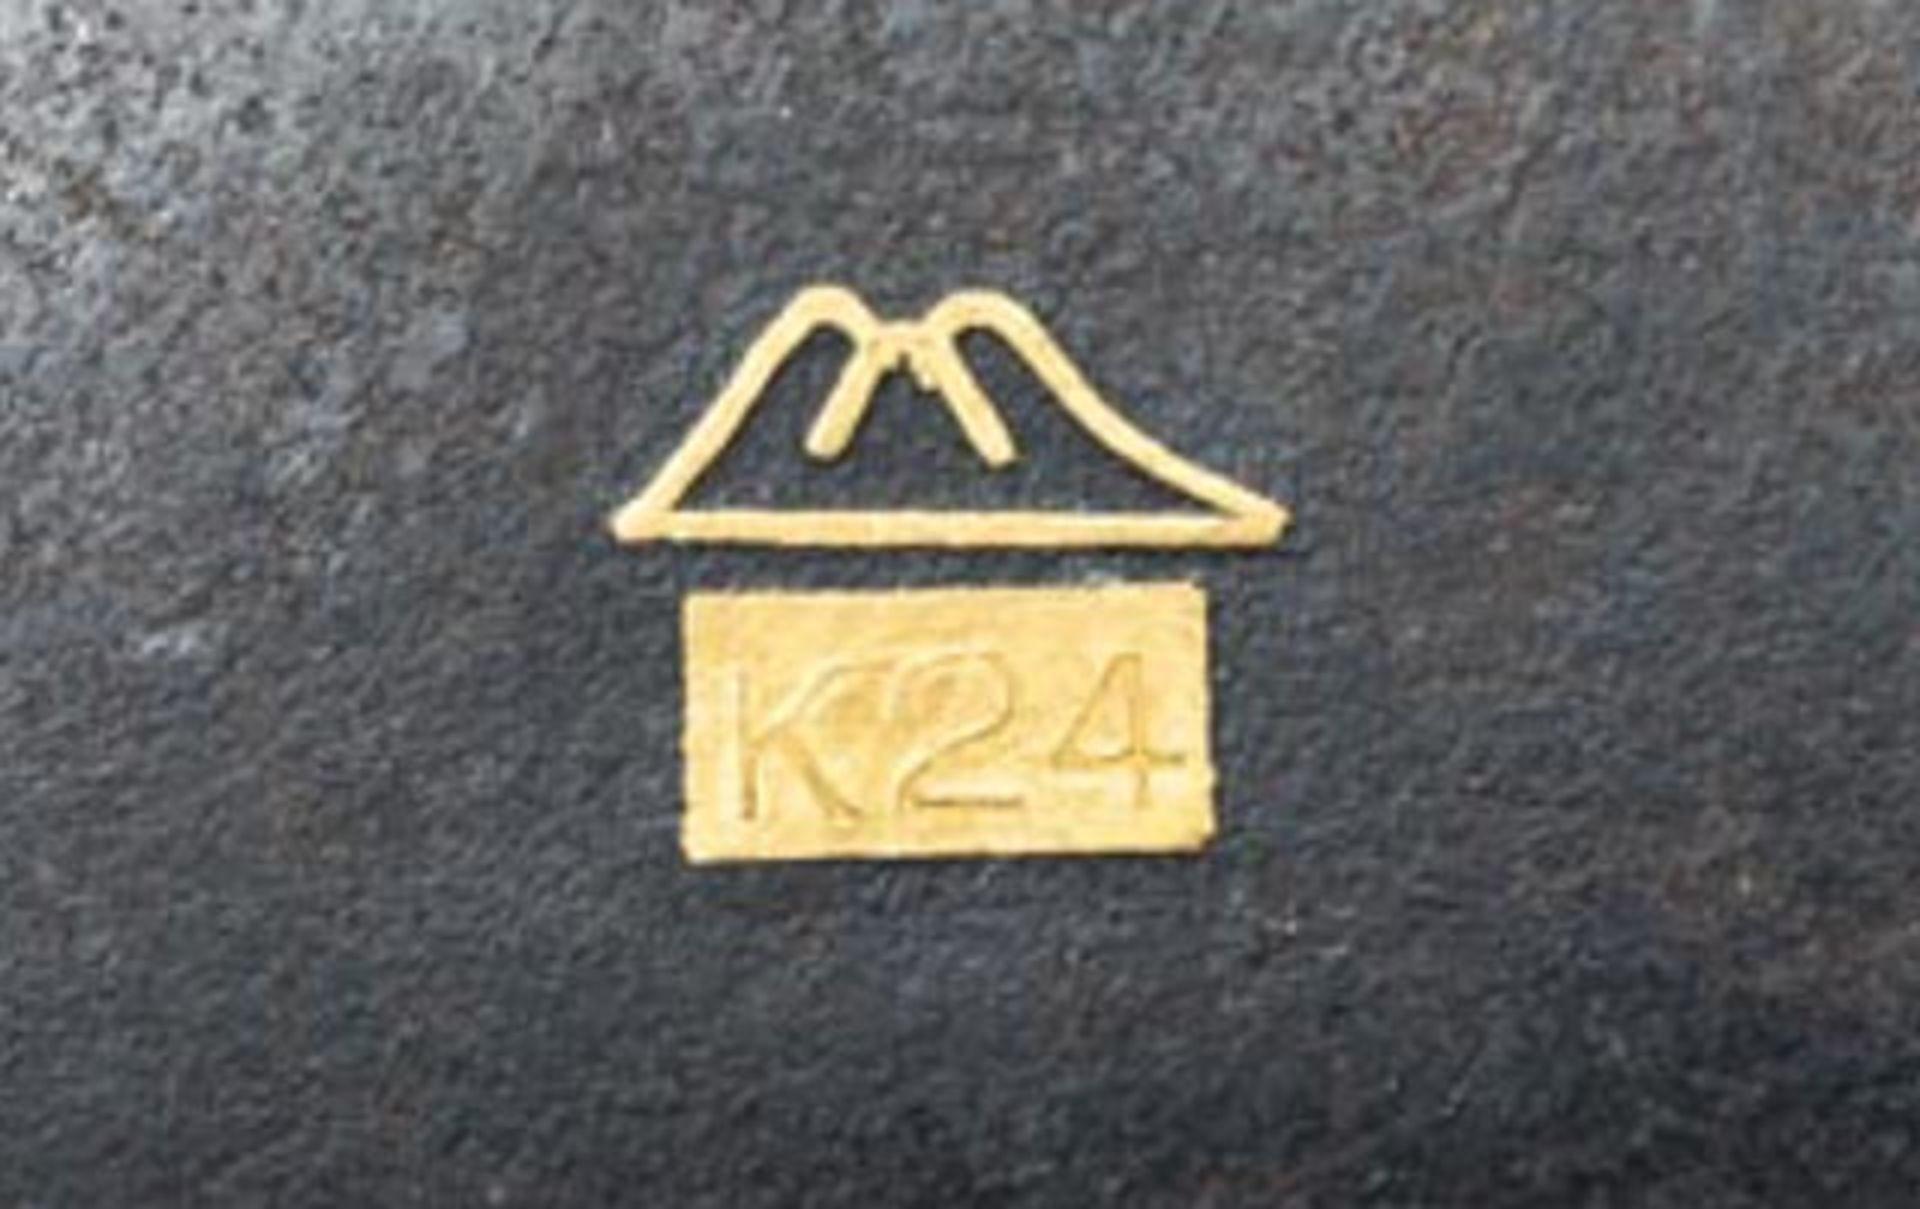 Gold tauschiertes Zigarettenetui - Image 4 of 4